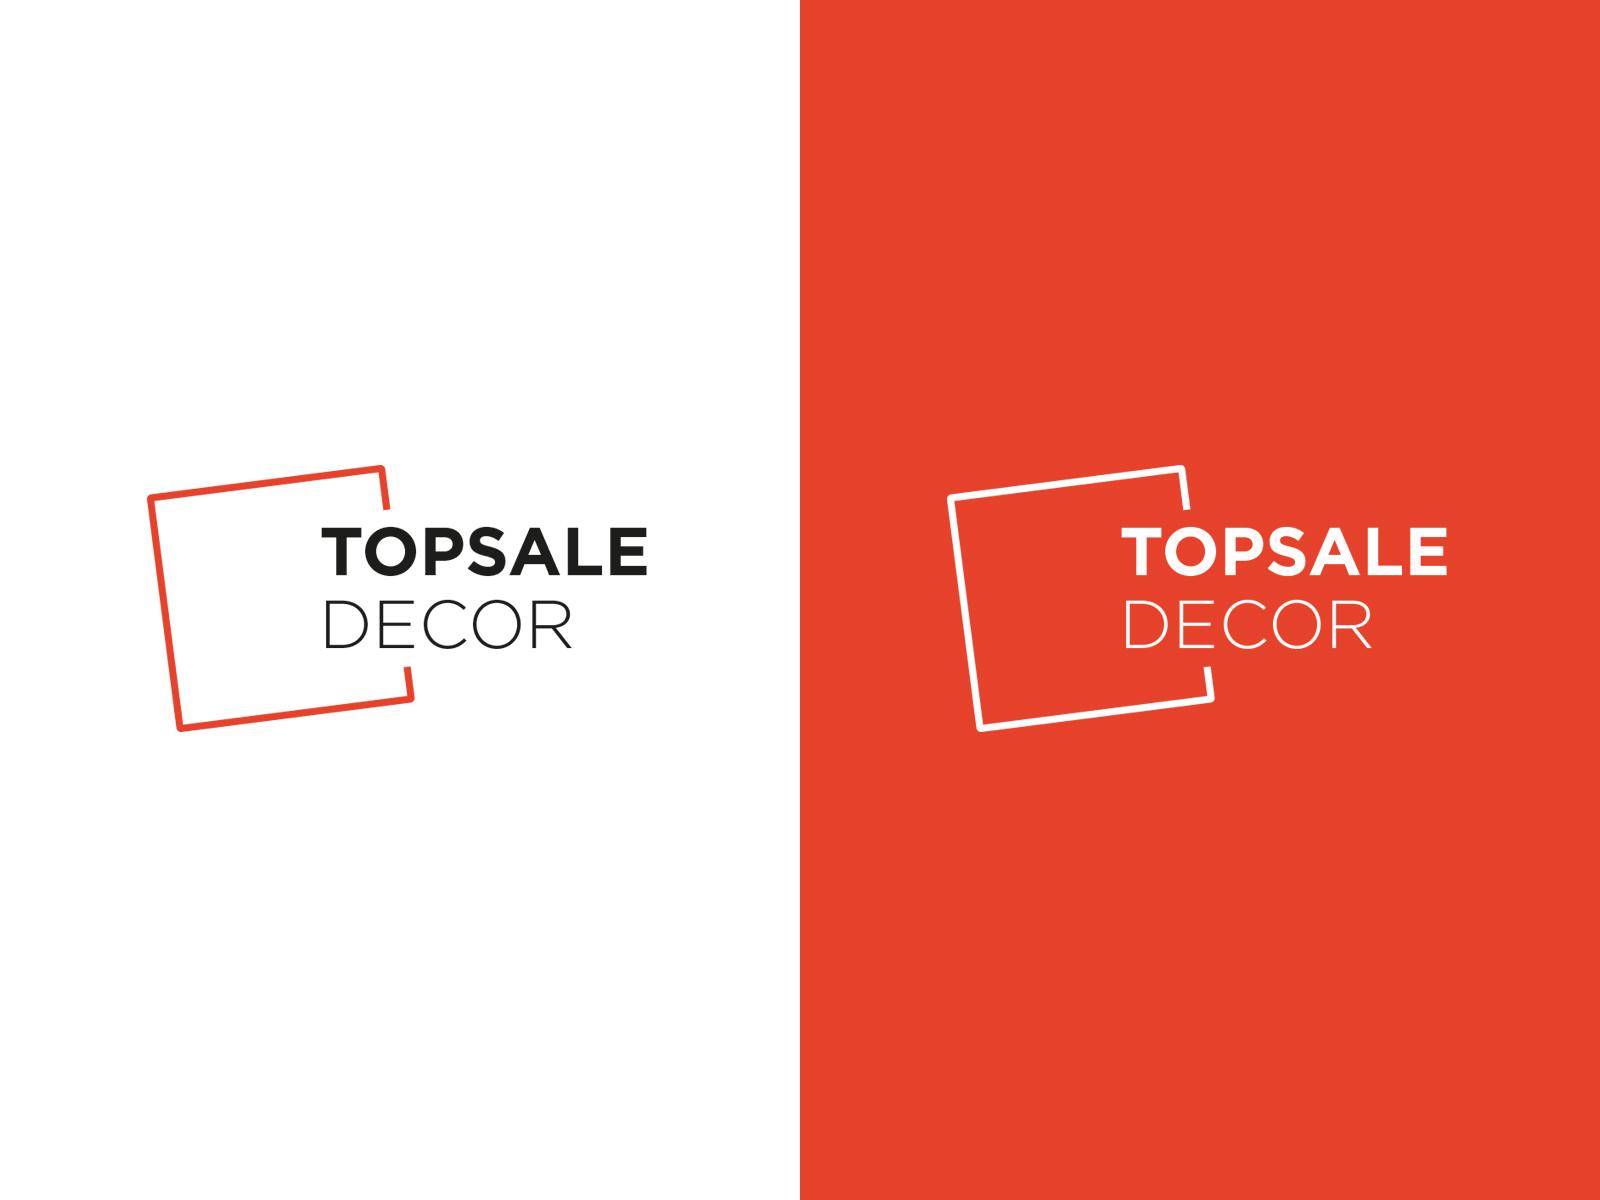 Topsale